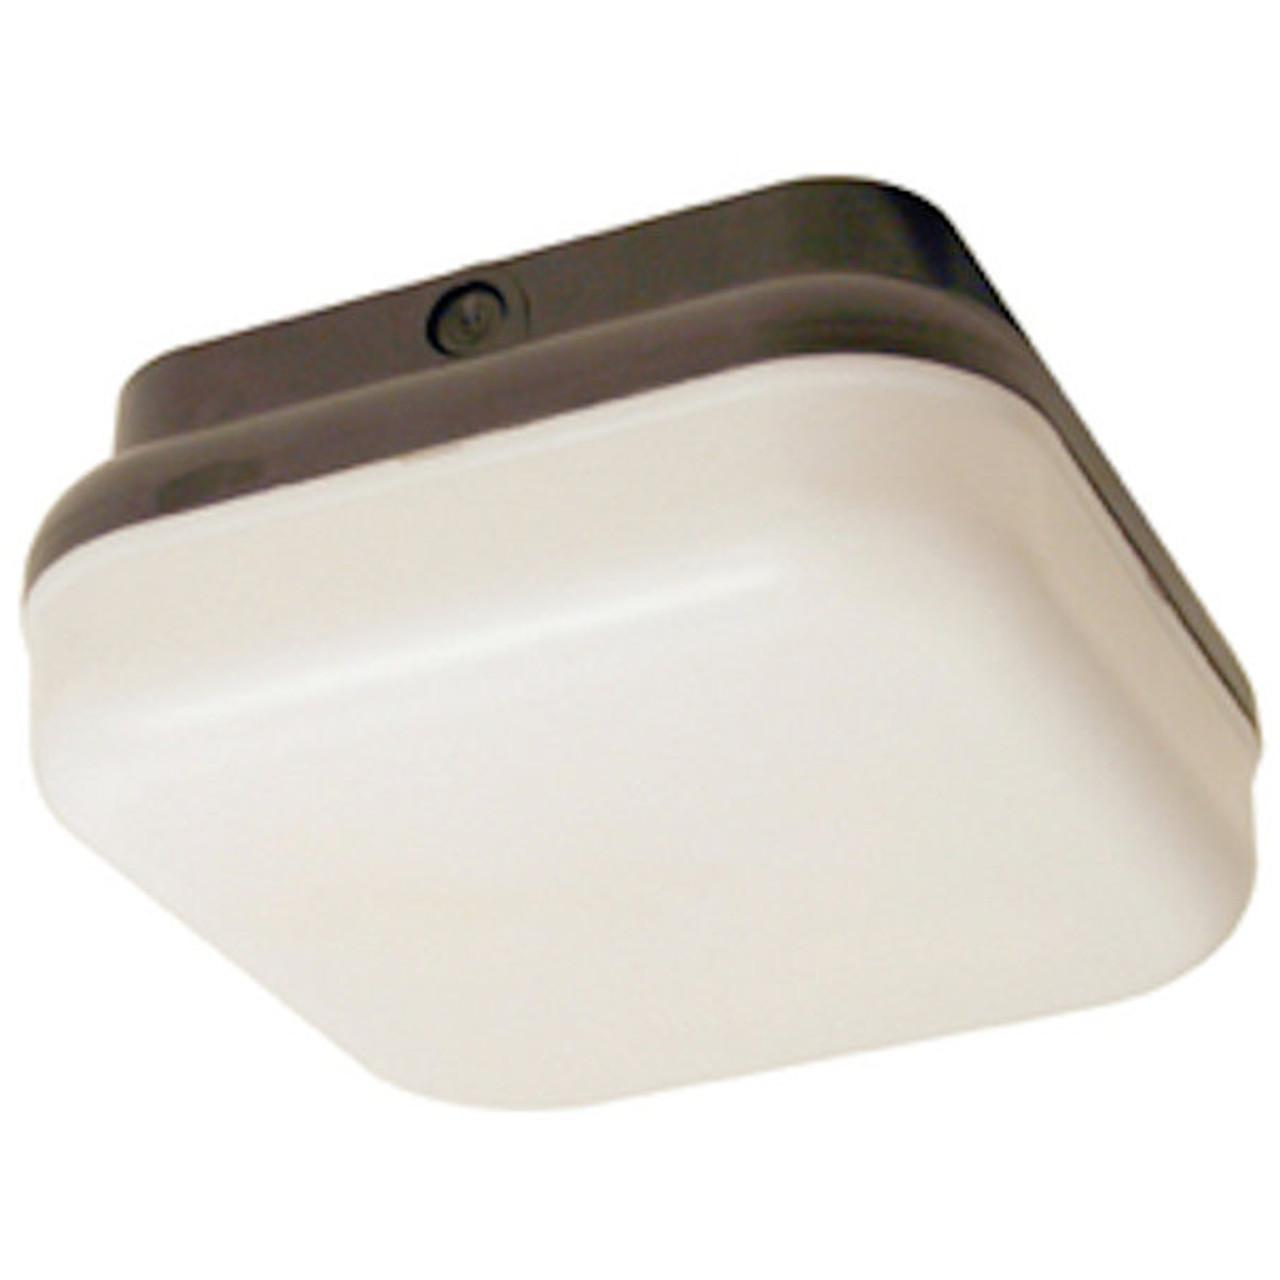 Liteco -L23219 Lighting - 13w 2-Light Ceiling Fixture White / Black